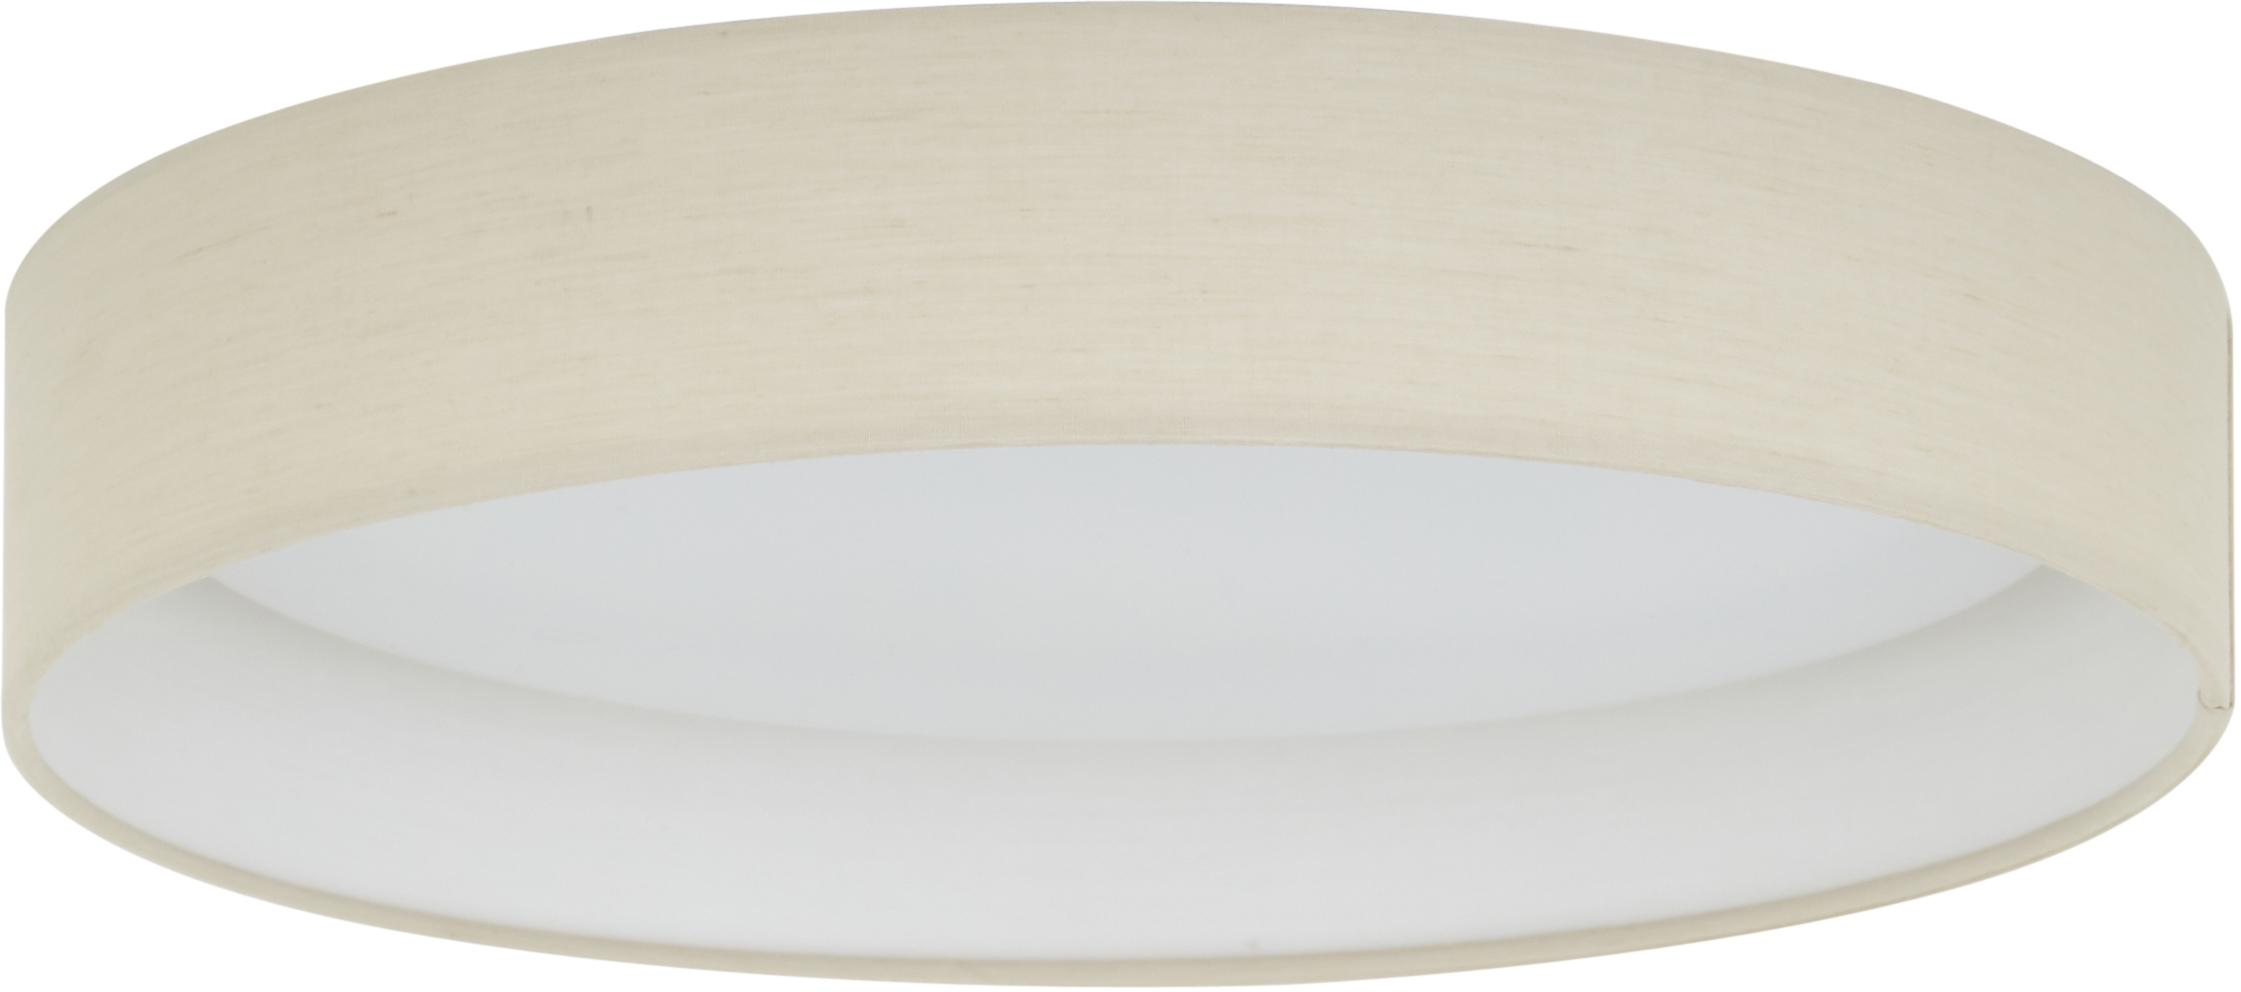 Plafón LED Helen, Gris pardo, Ø 35 x Al 7 cm